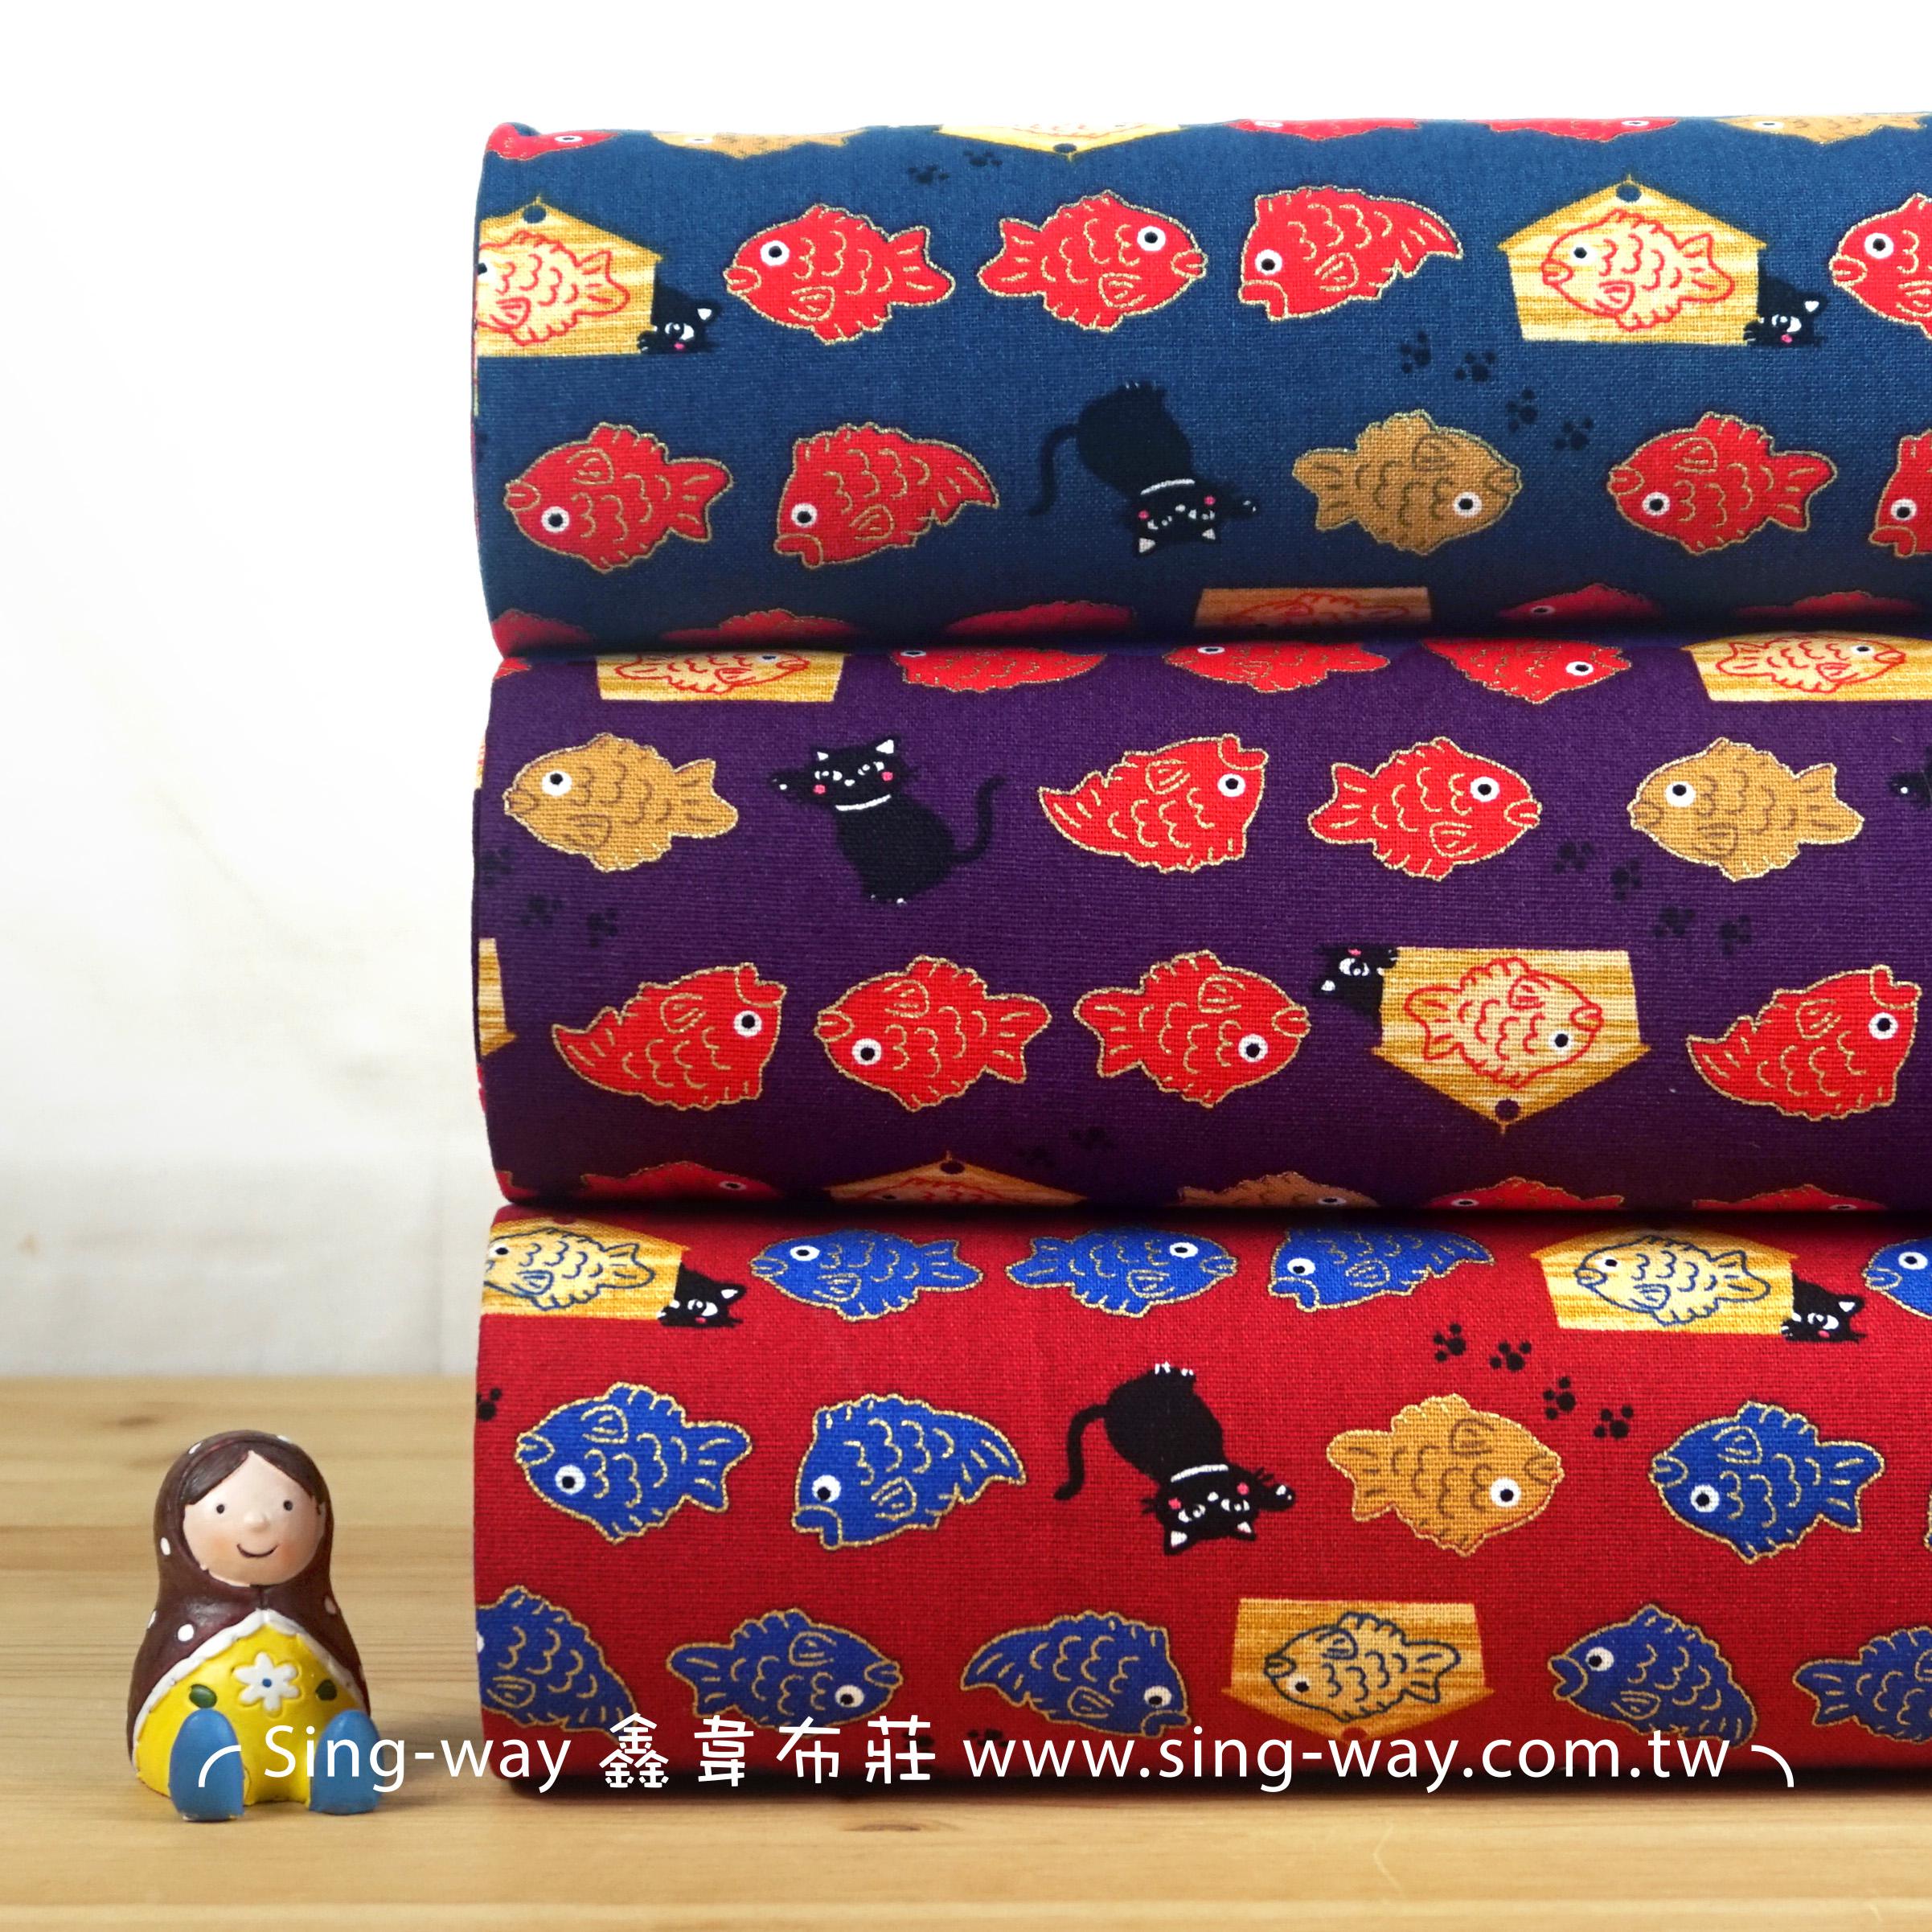 燙金貓吃鯛魚燒 日式和風燙金邊 貓咪 喵喵 たい焼き 鯛焼き 手工藝DIy拼布布料 CF550626